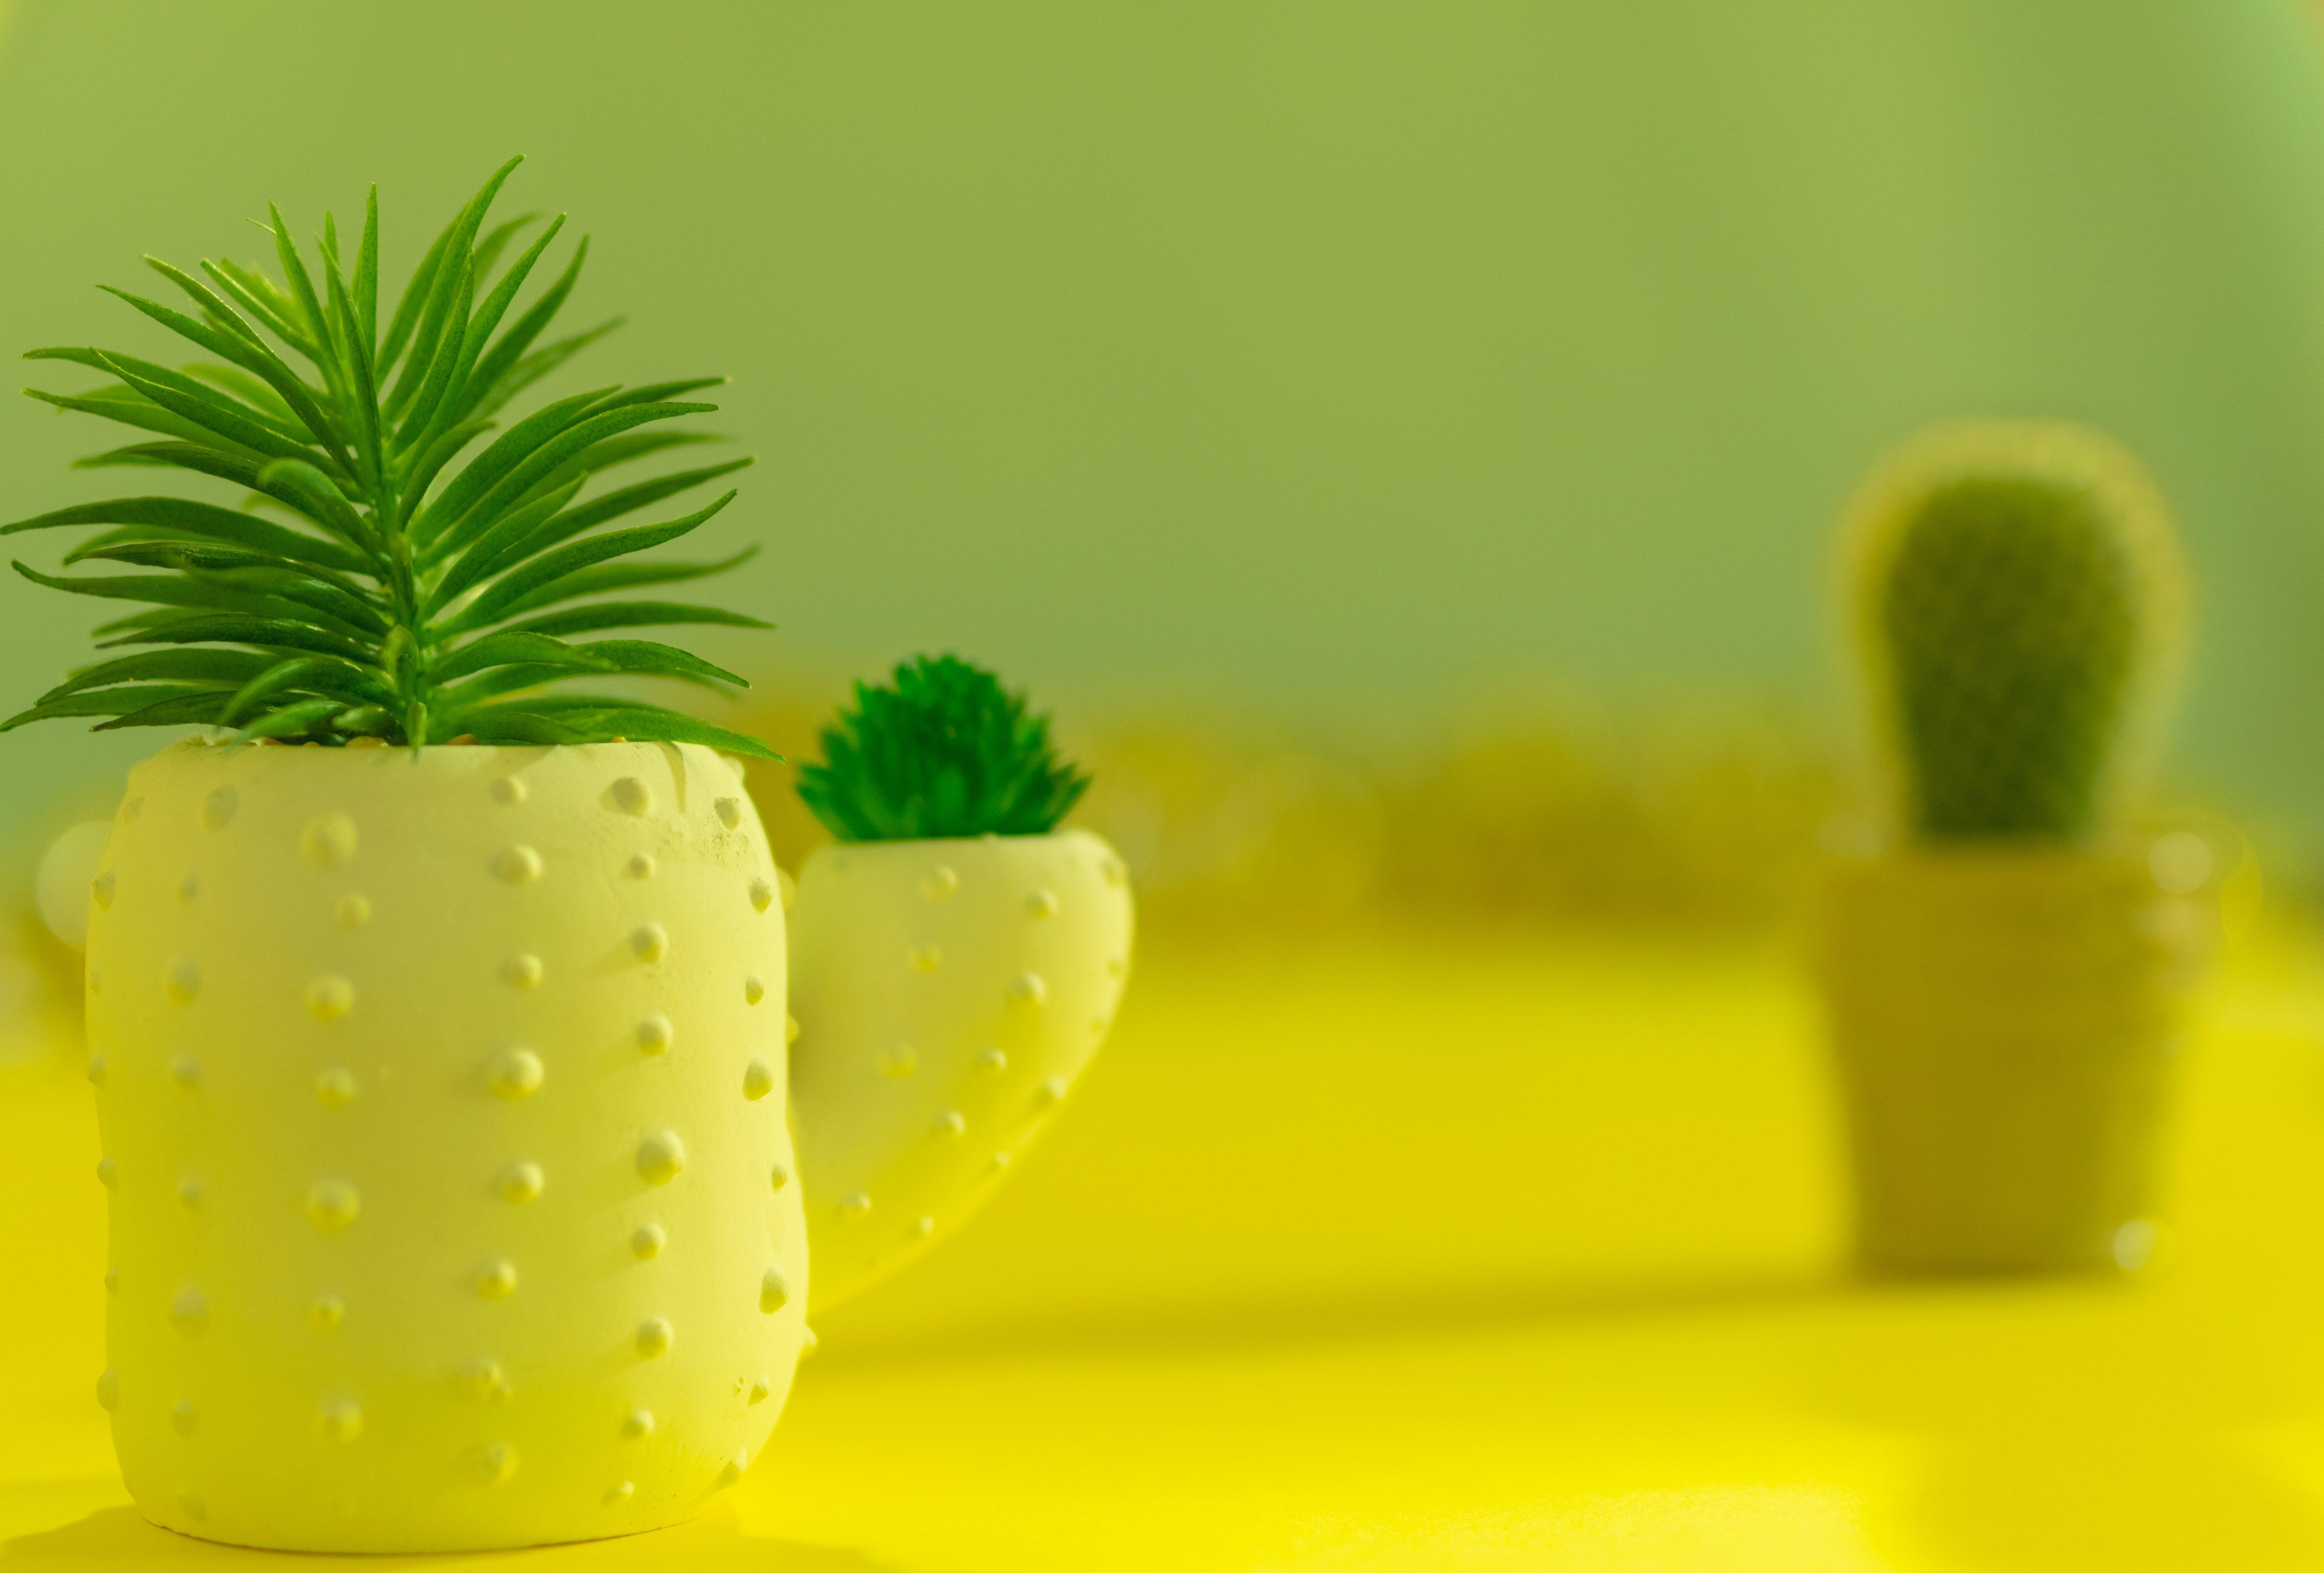 Free stock photo of cactus, cactus plant, cactus potplants, cactuses